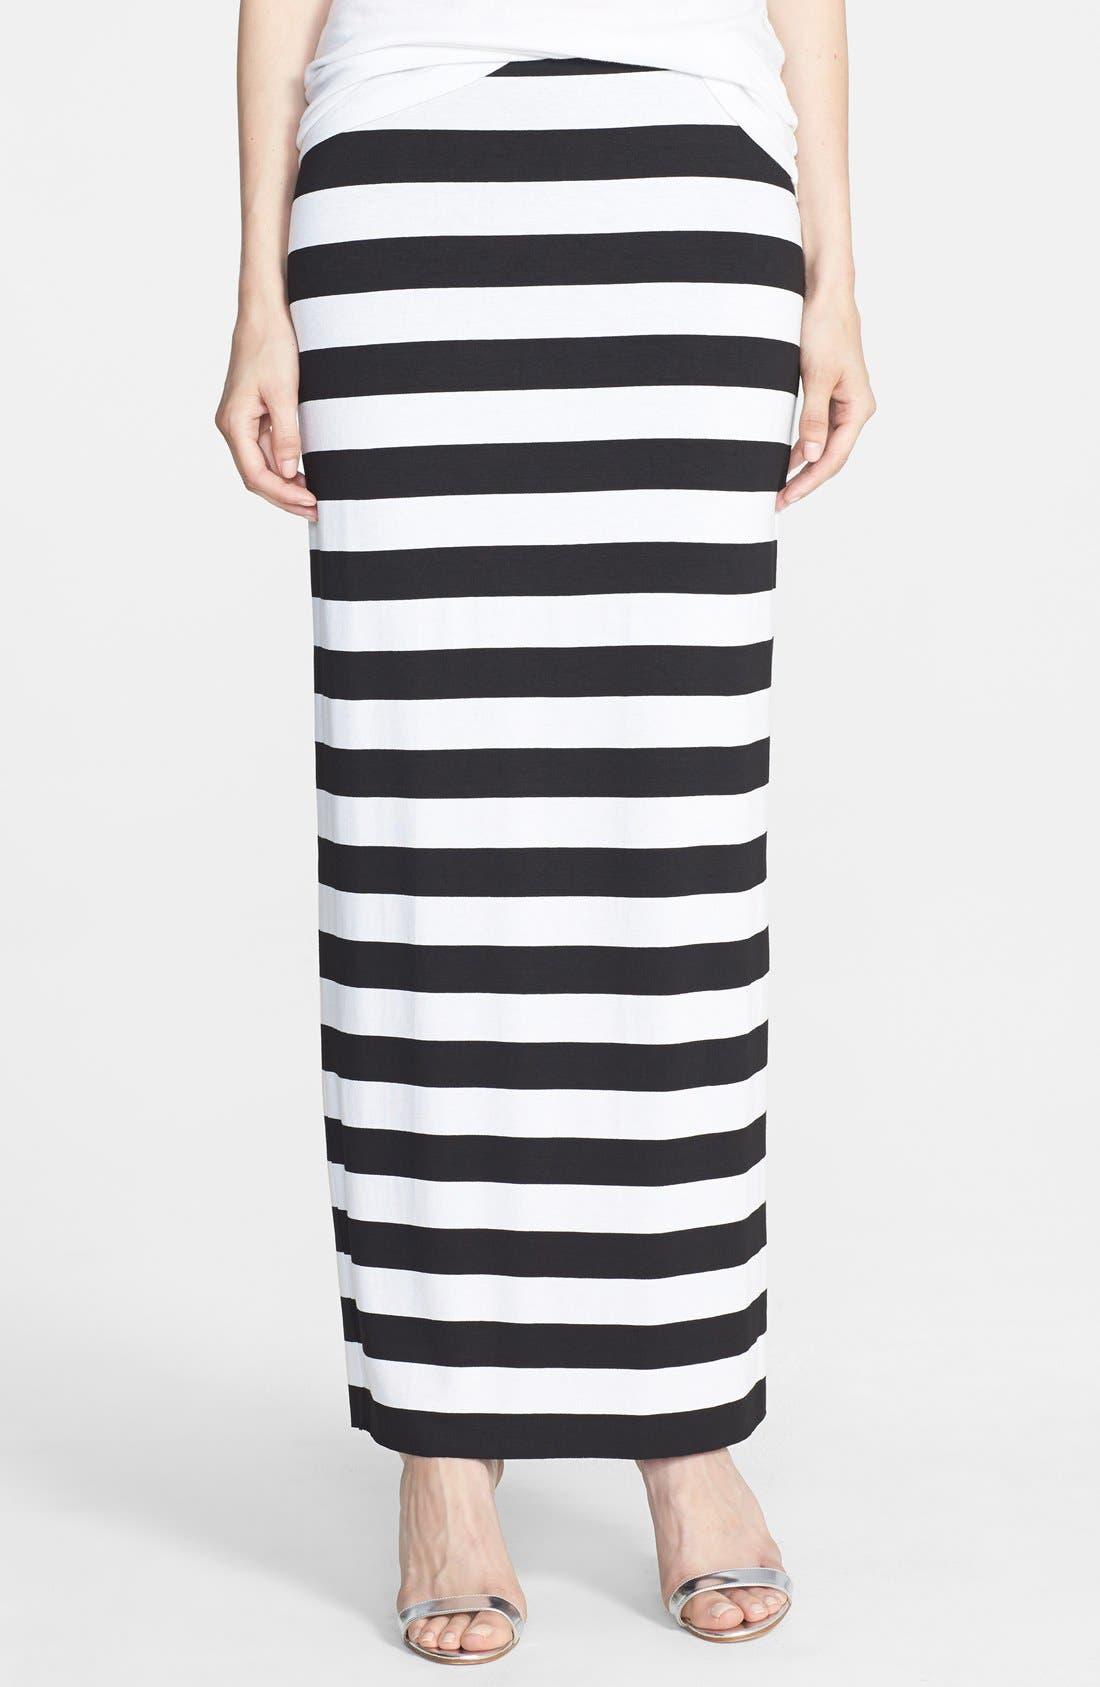 Alternate Image 1 Selected - Bailey 44 'Stella' Stripe Maxi Skirt